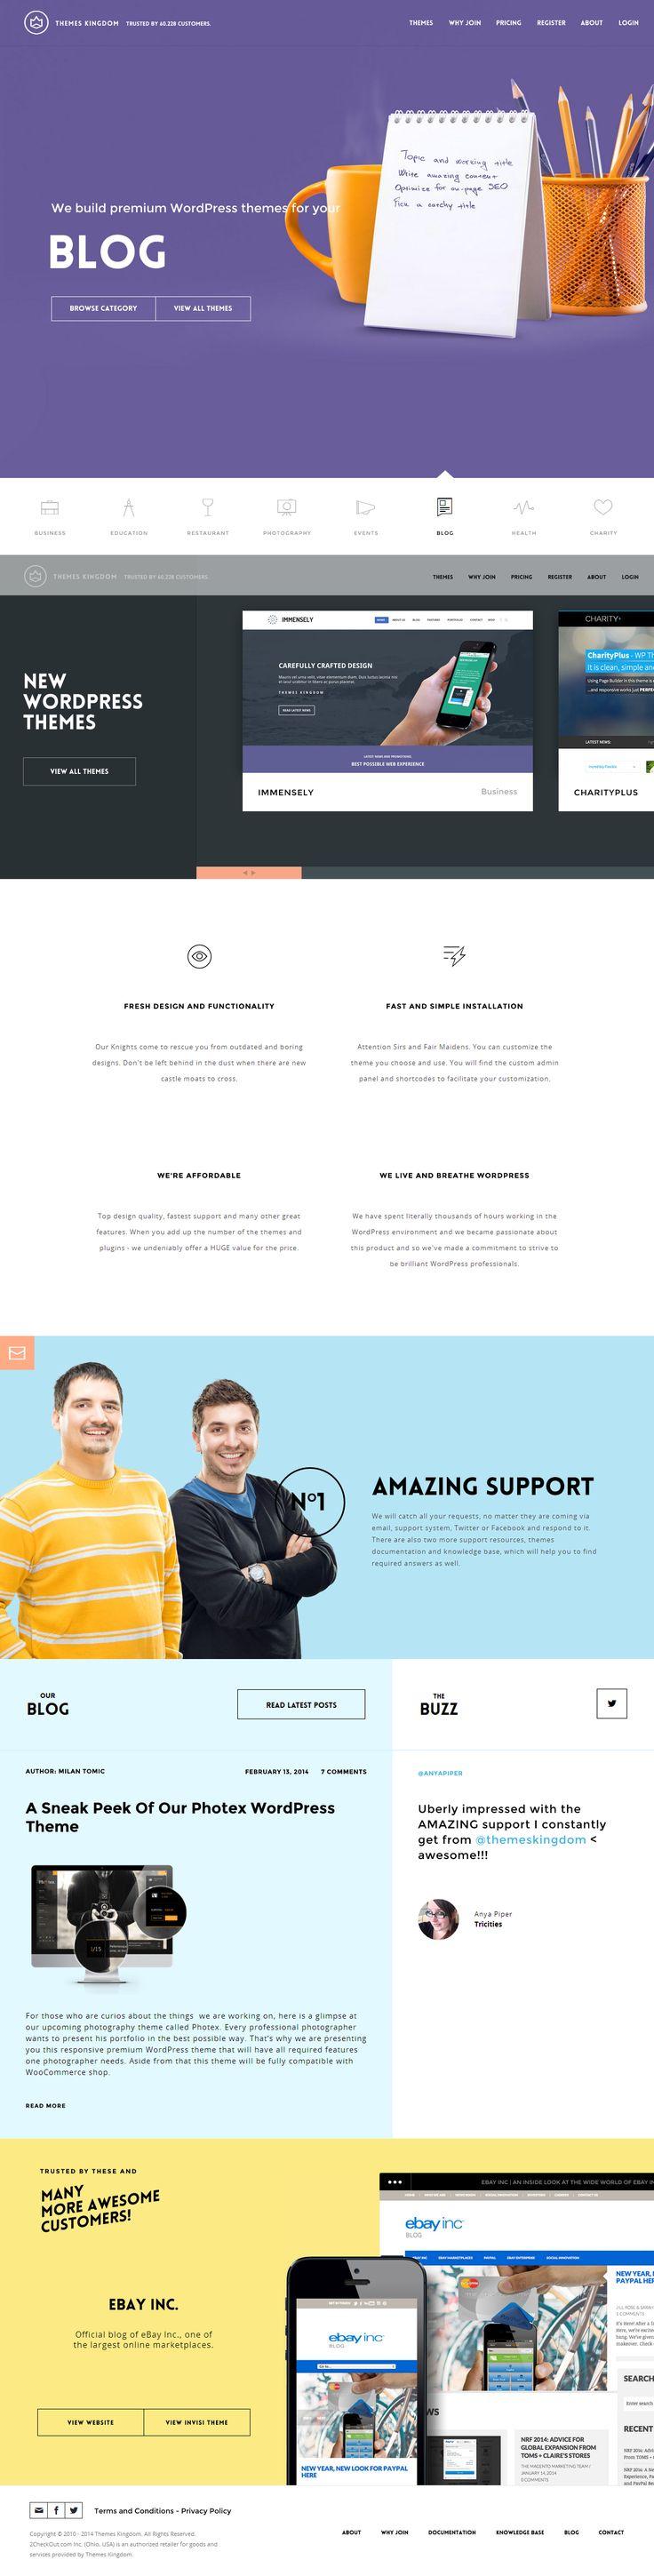 Themes Kingdom - Premium WordPress Themes, 25 January 2014. http://www.awwwards.com/web-design-awards/themes-kingdom-premium-wordpress-themes